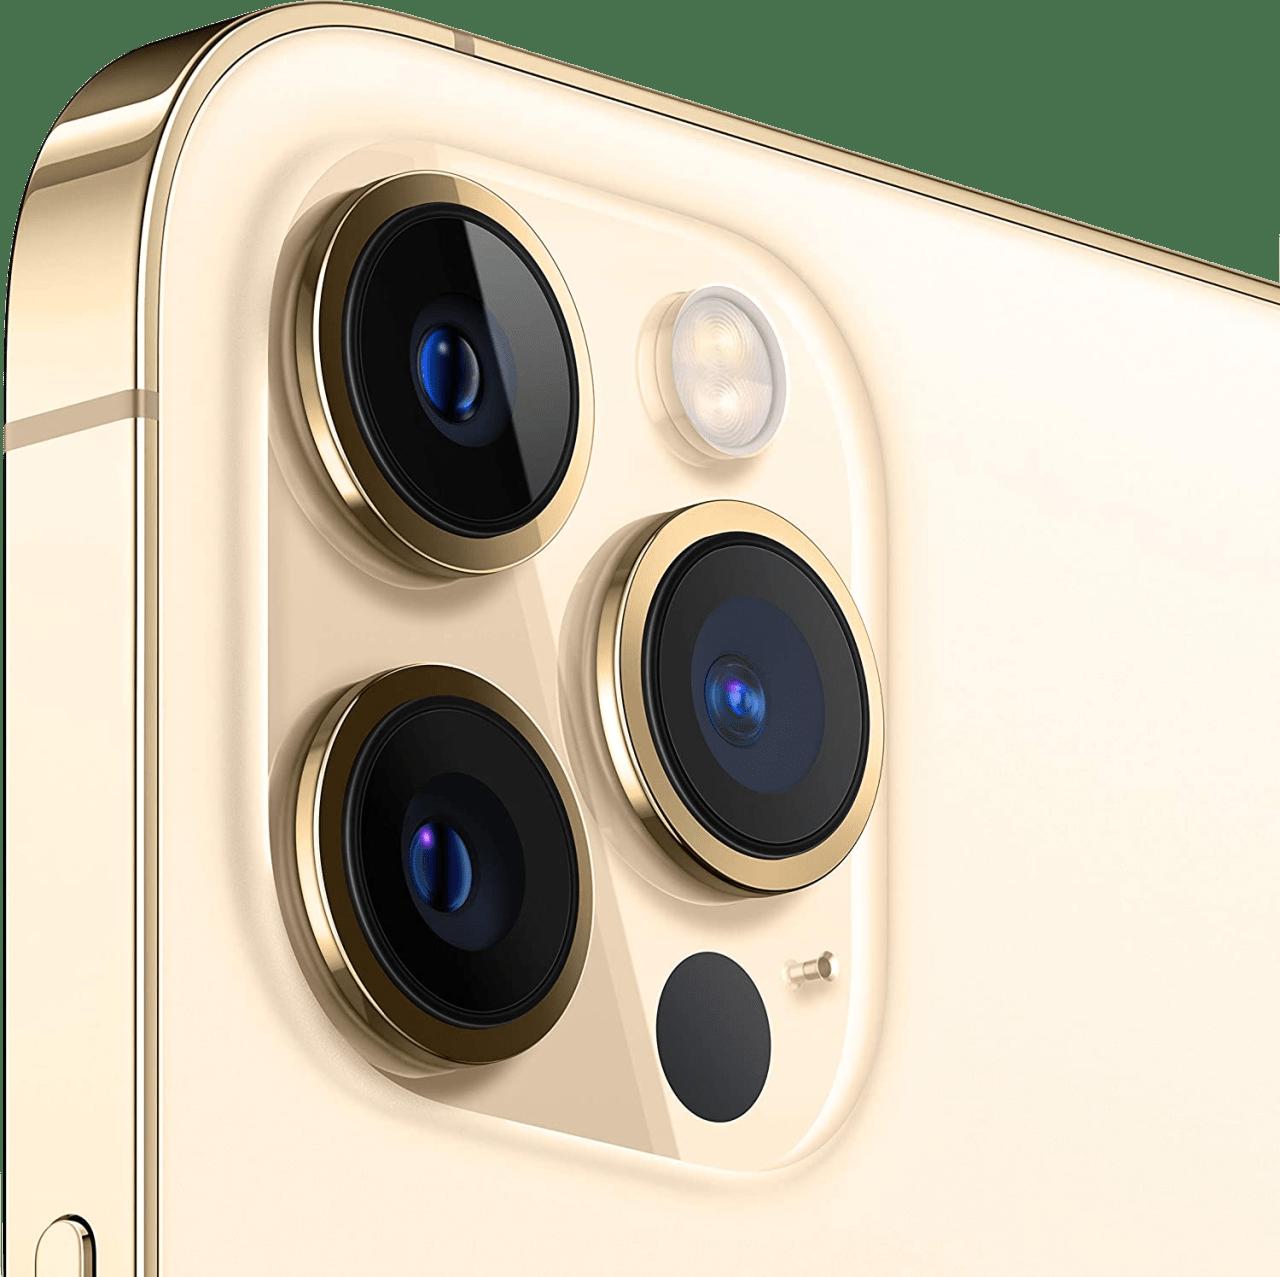 Gold Apple iPhone 12 Pro Max - 256GB - Dual Sim.2